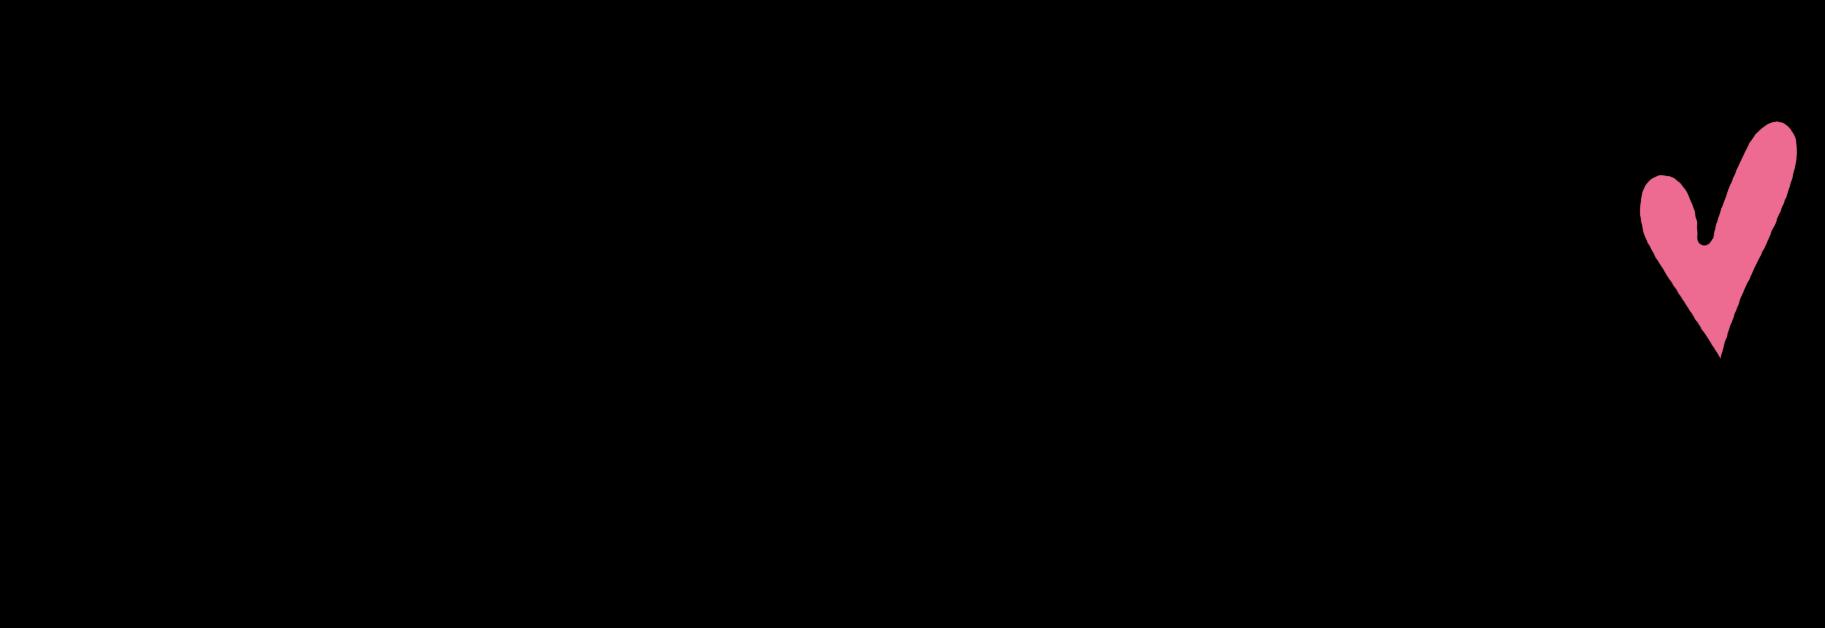 Glunderkaartjes